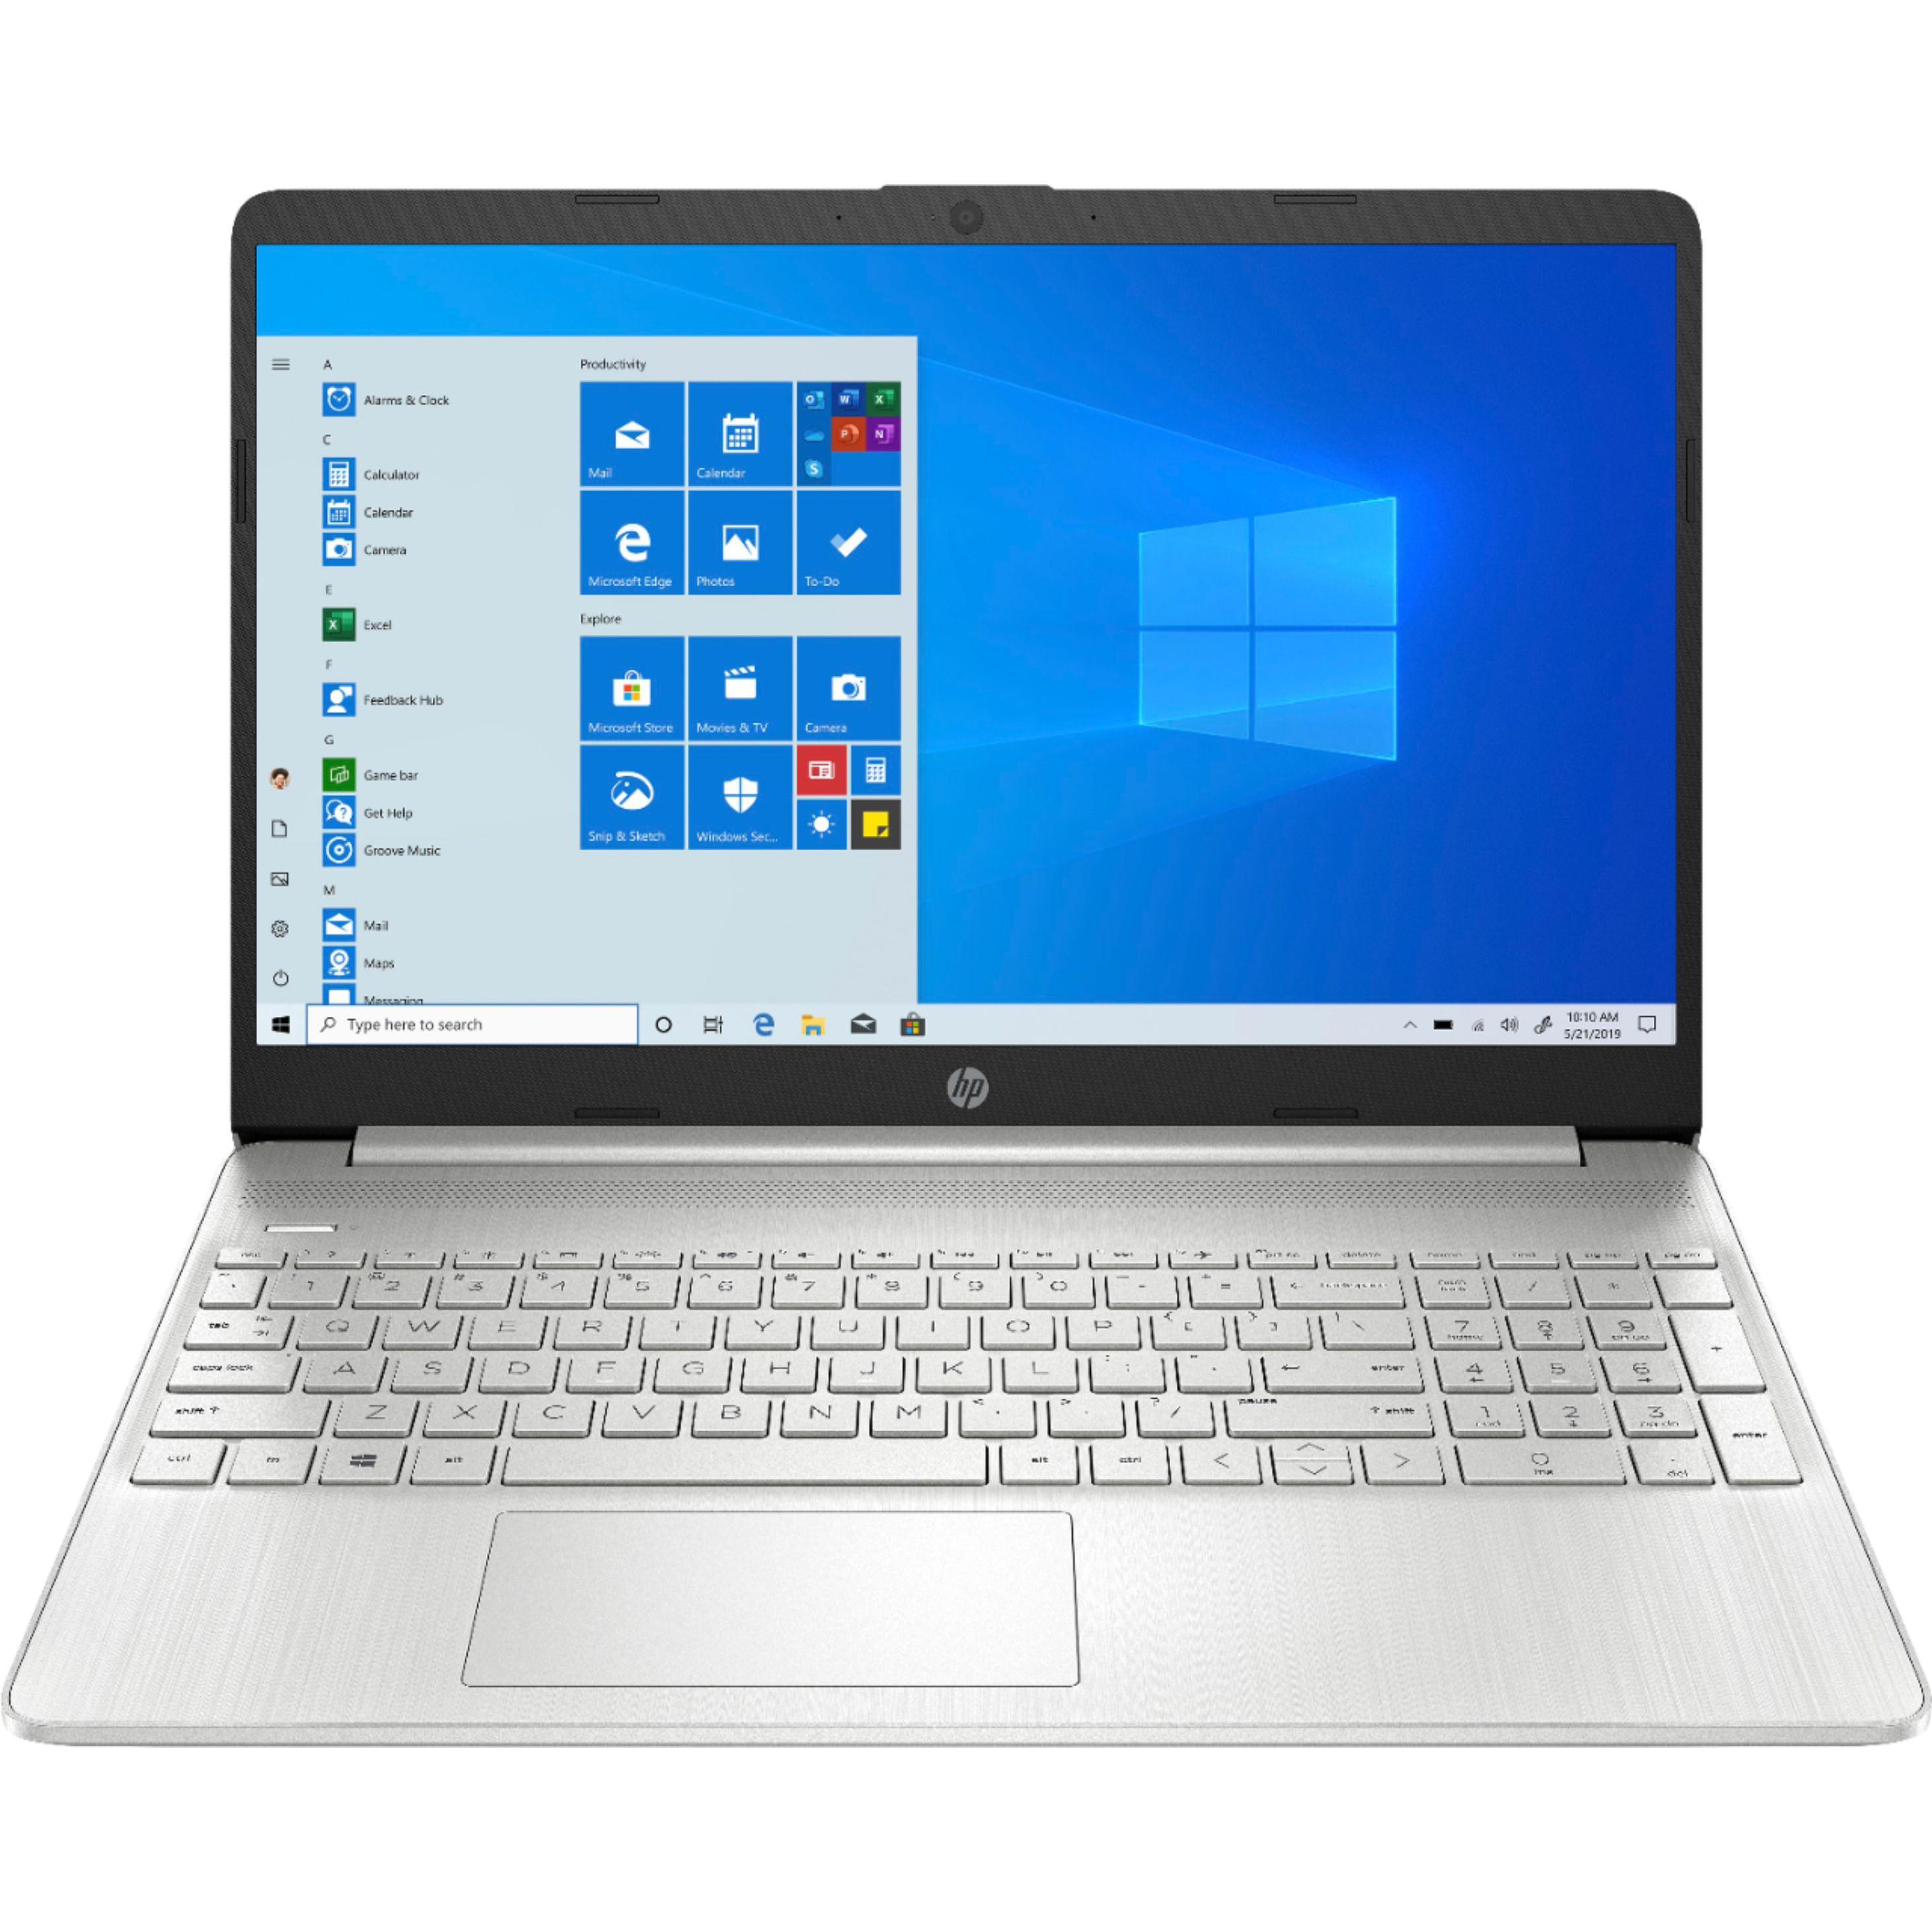 Hp NoteBook 15-dy1036nr 15.6-inch (2019) - Core i5-1035G1 - 8 GB - SSD 512 GB